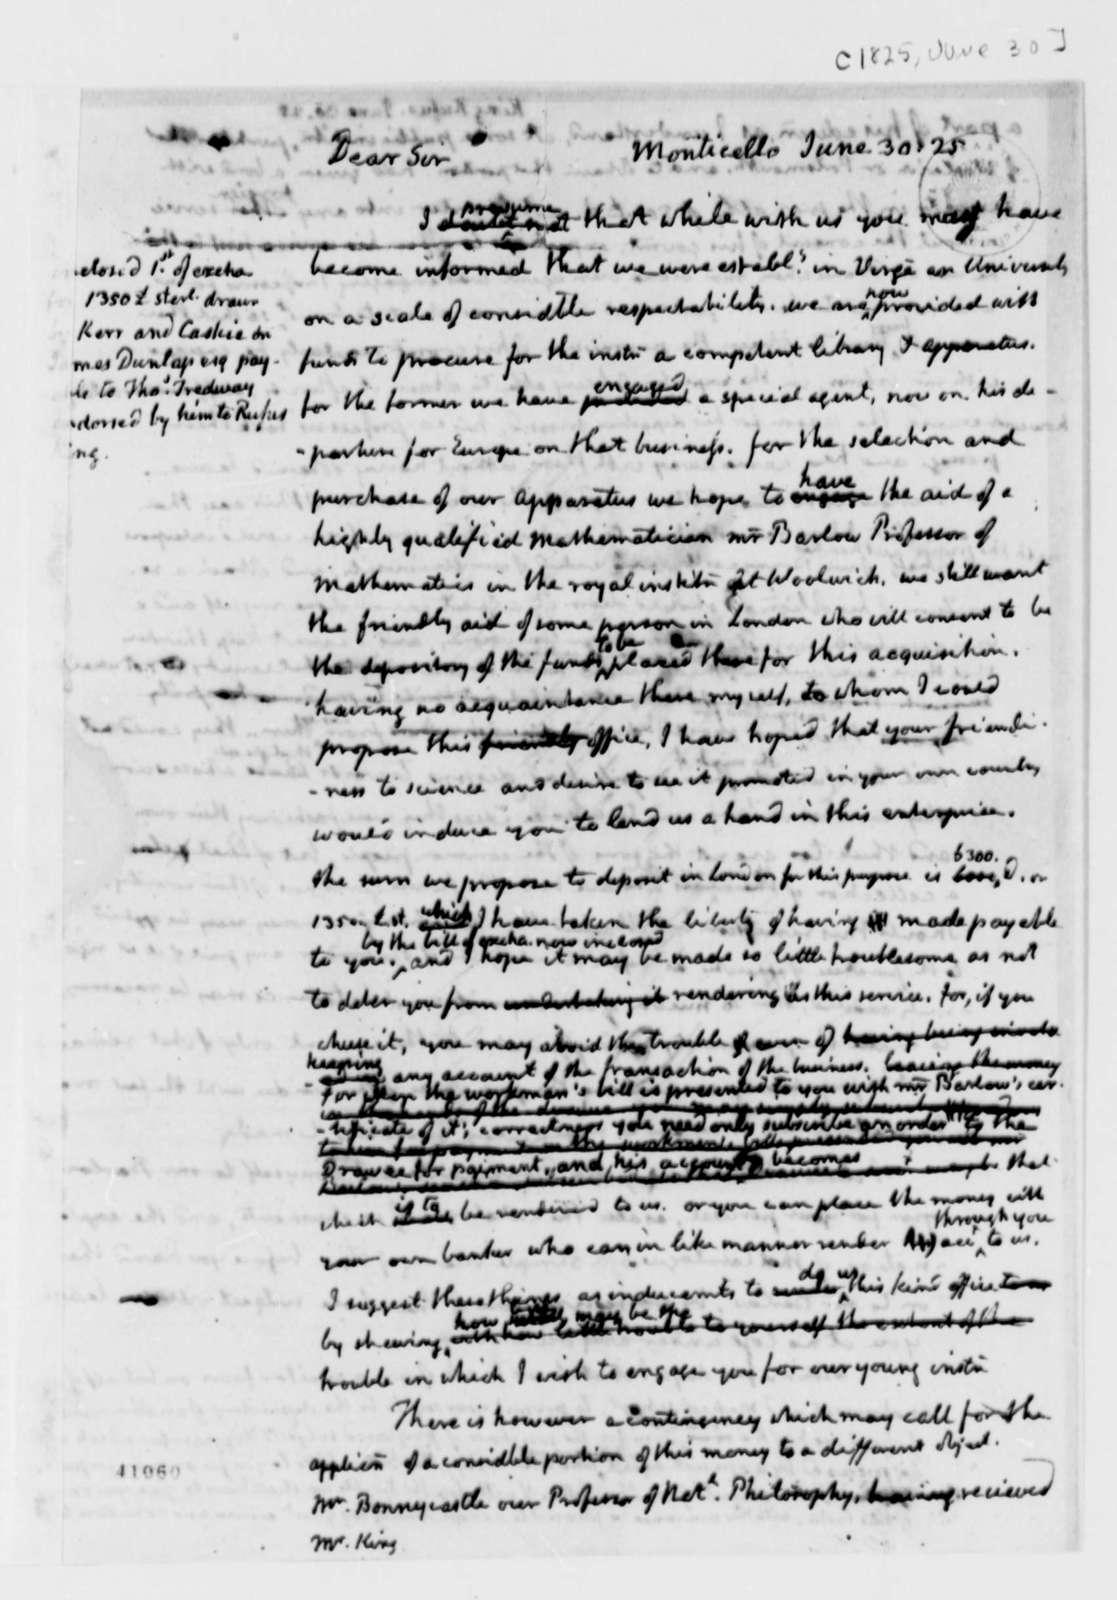 Thomas Jefferson to Rufus King, June 30, 1825